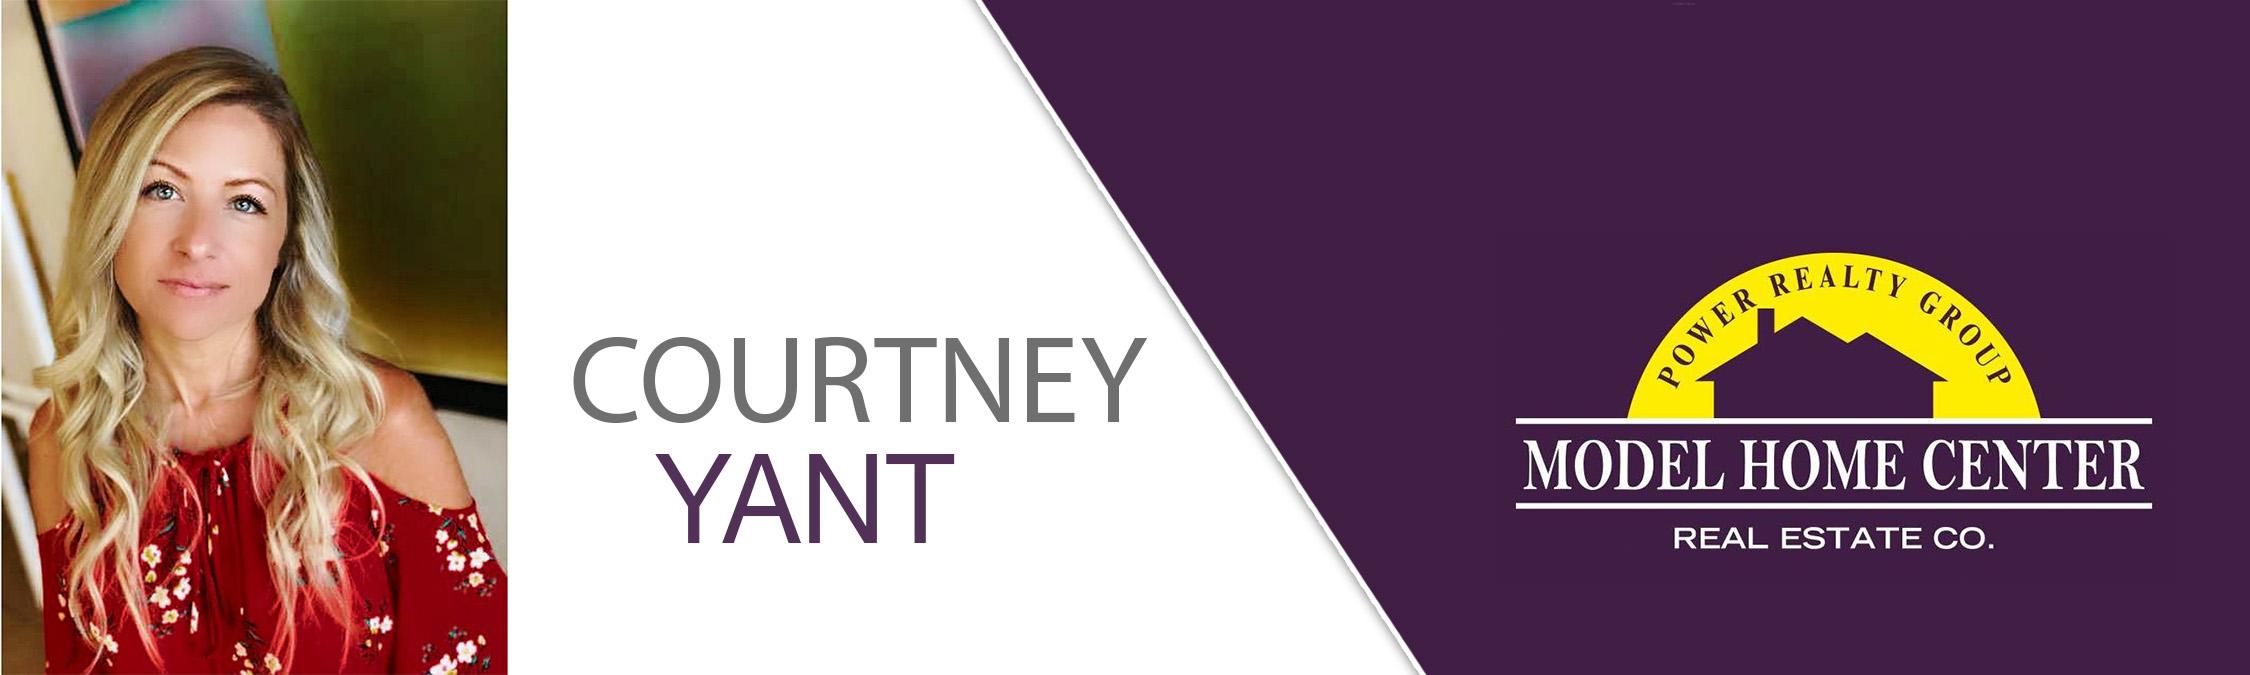 Courtney Logo.jpg